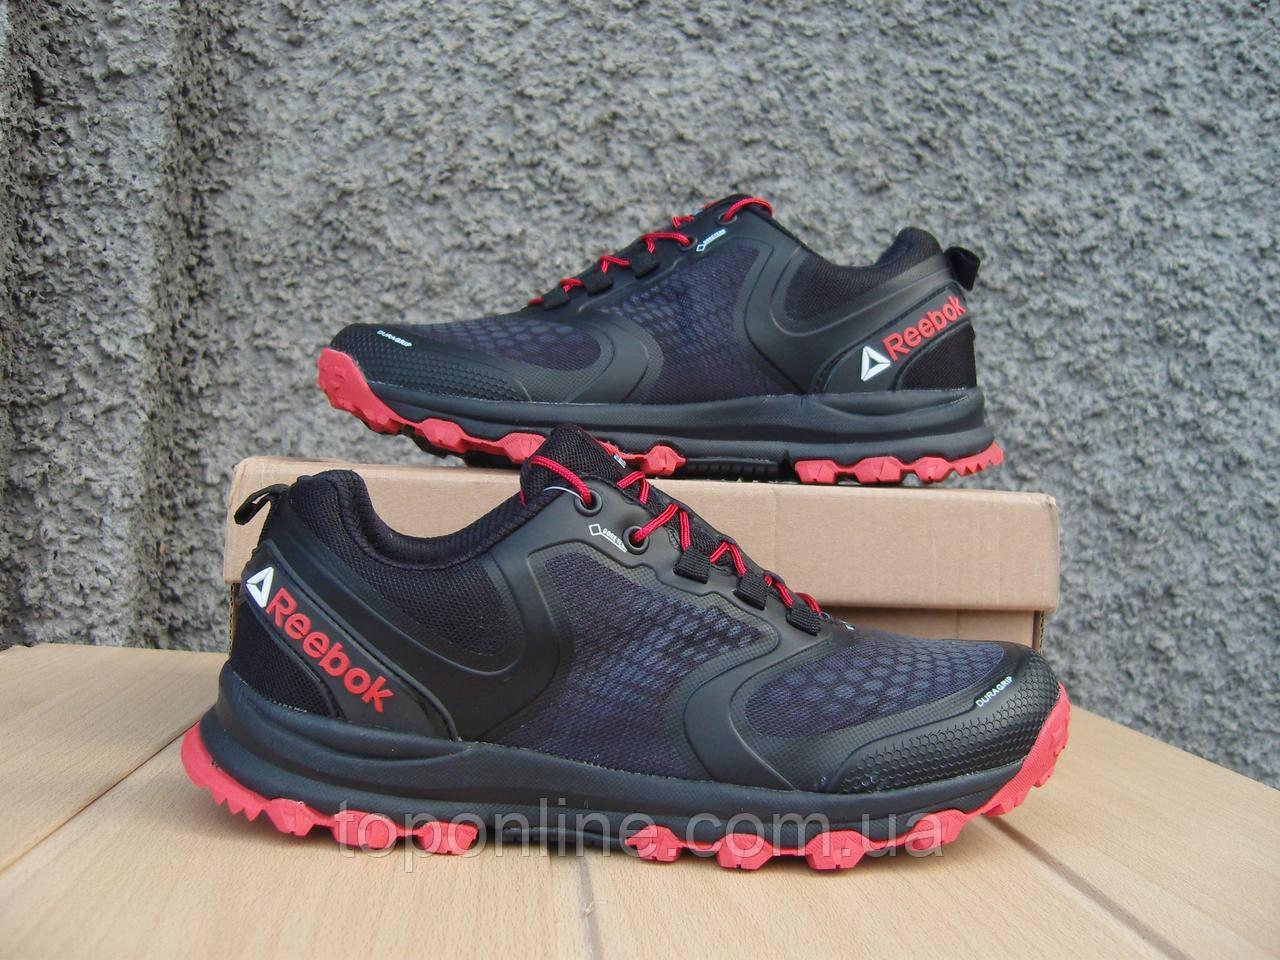 e443b0206e42 Мужские кроссовки Reebok All Terrain Extreme GTX черно серо красные -  TOP-ONLINE